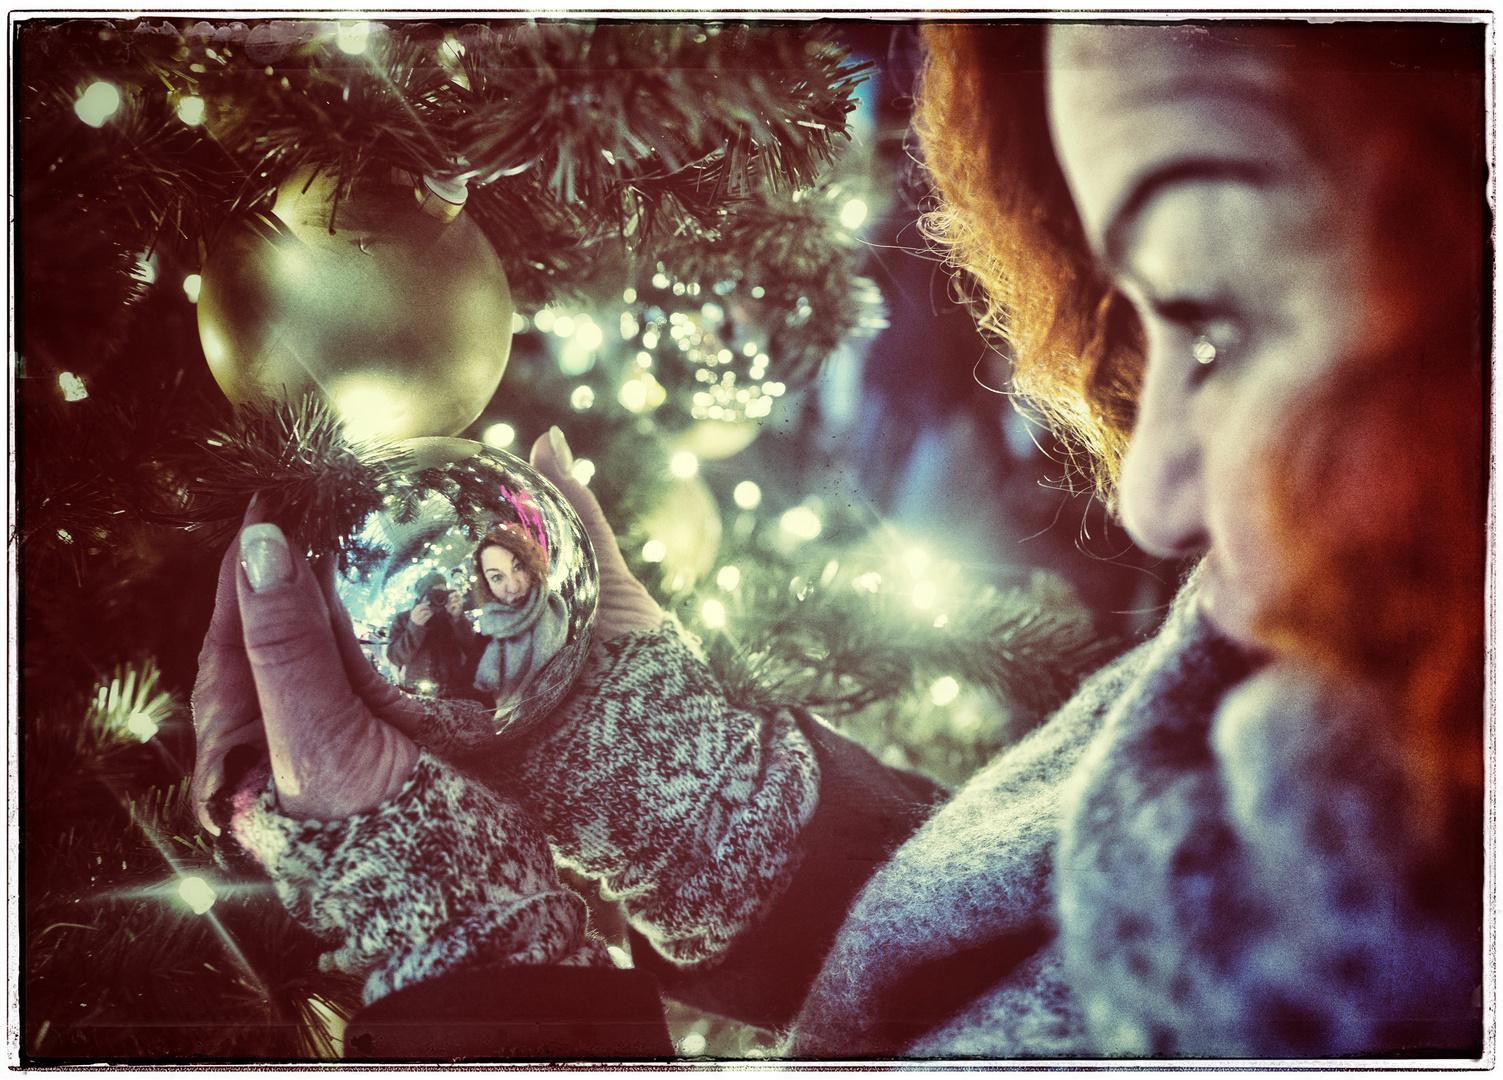 Advent,Advent isch hold äh Kugel in de Händ !